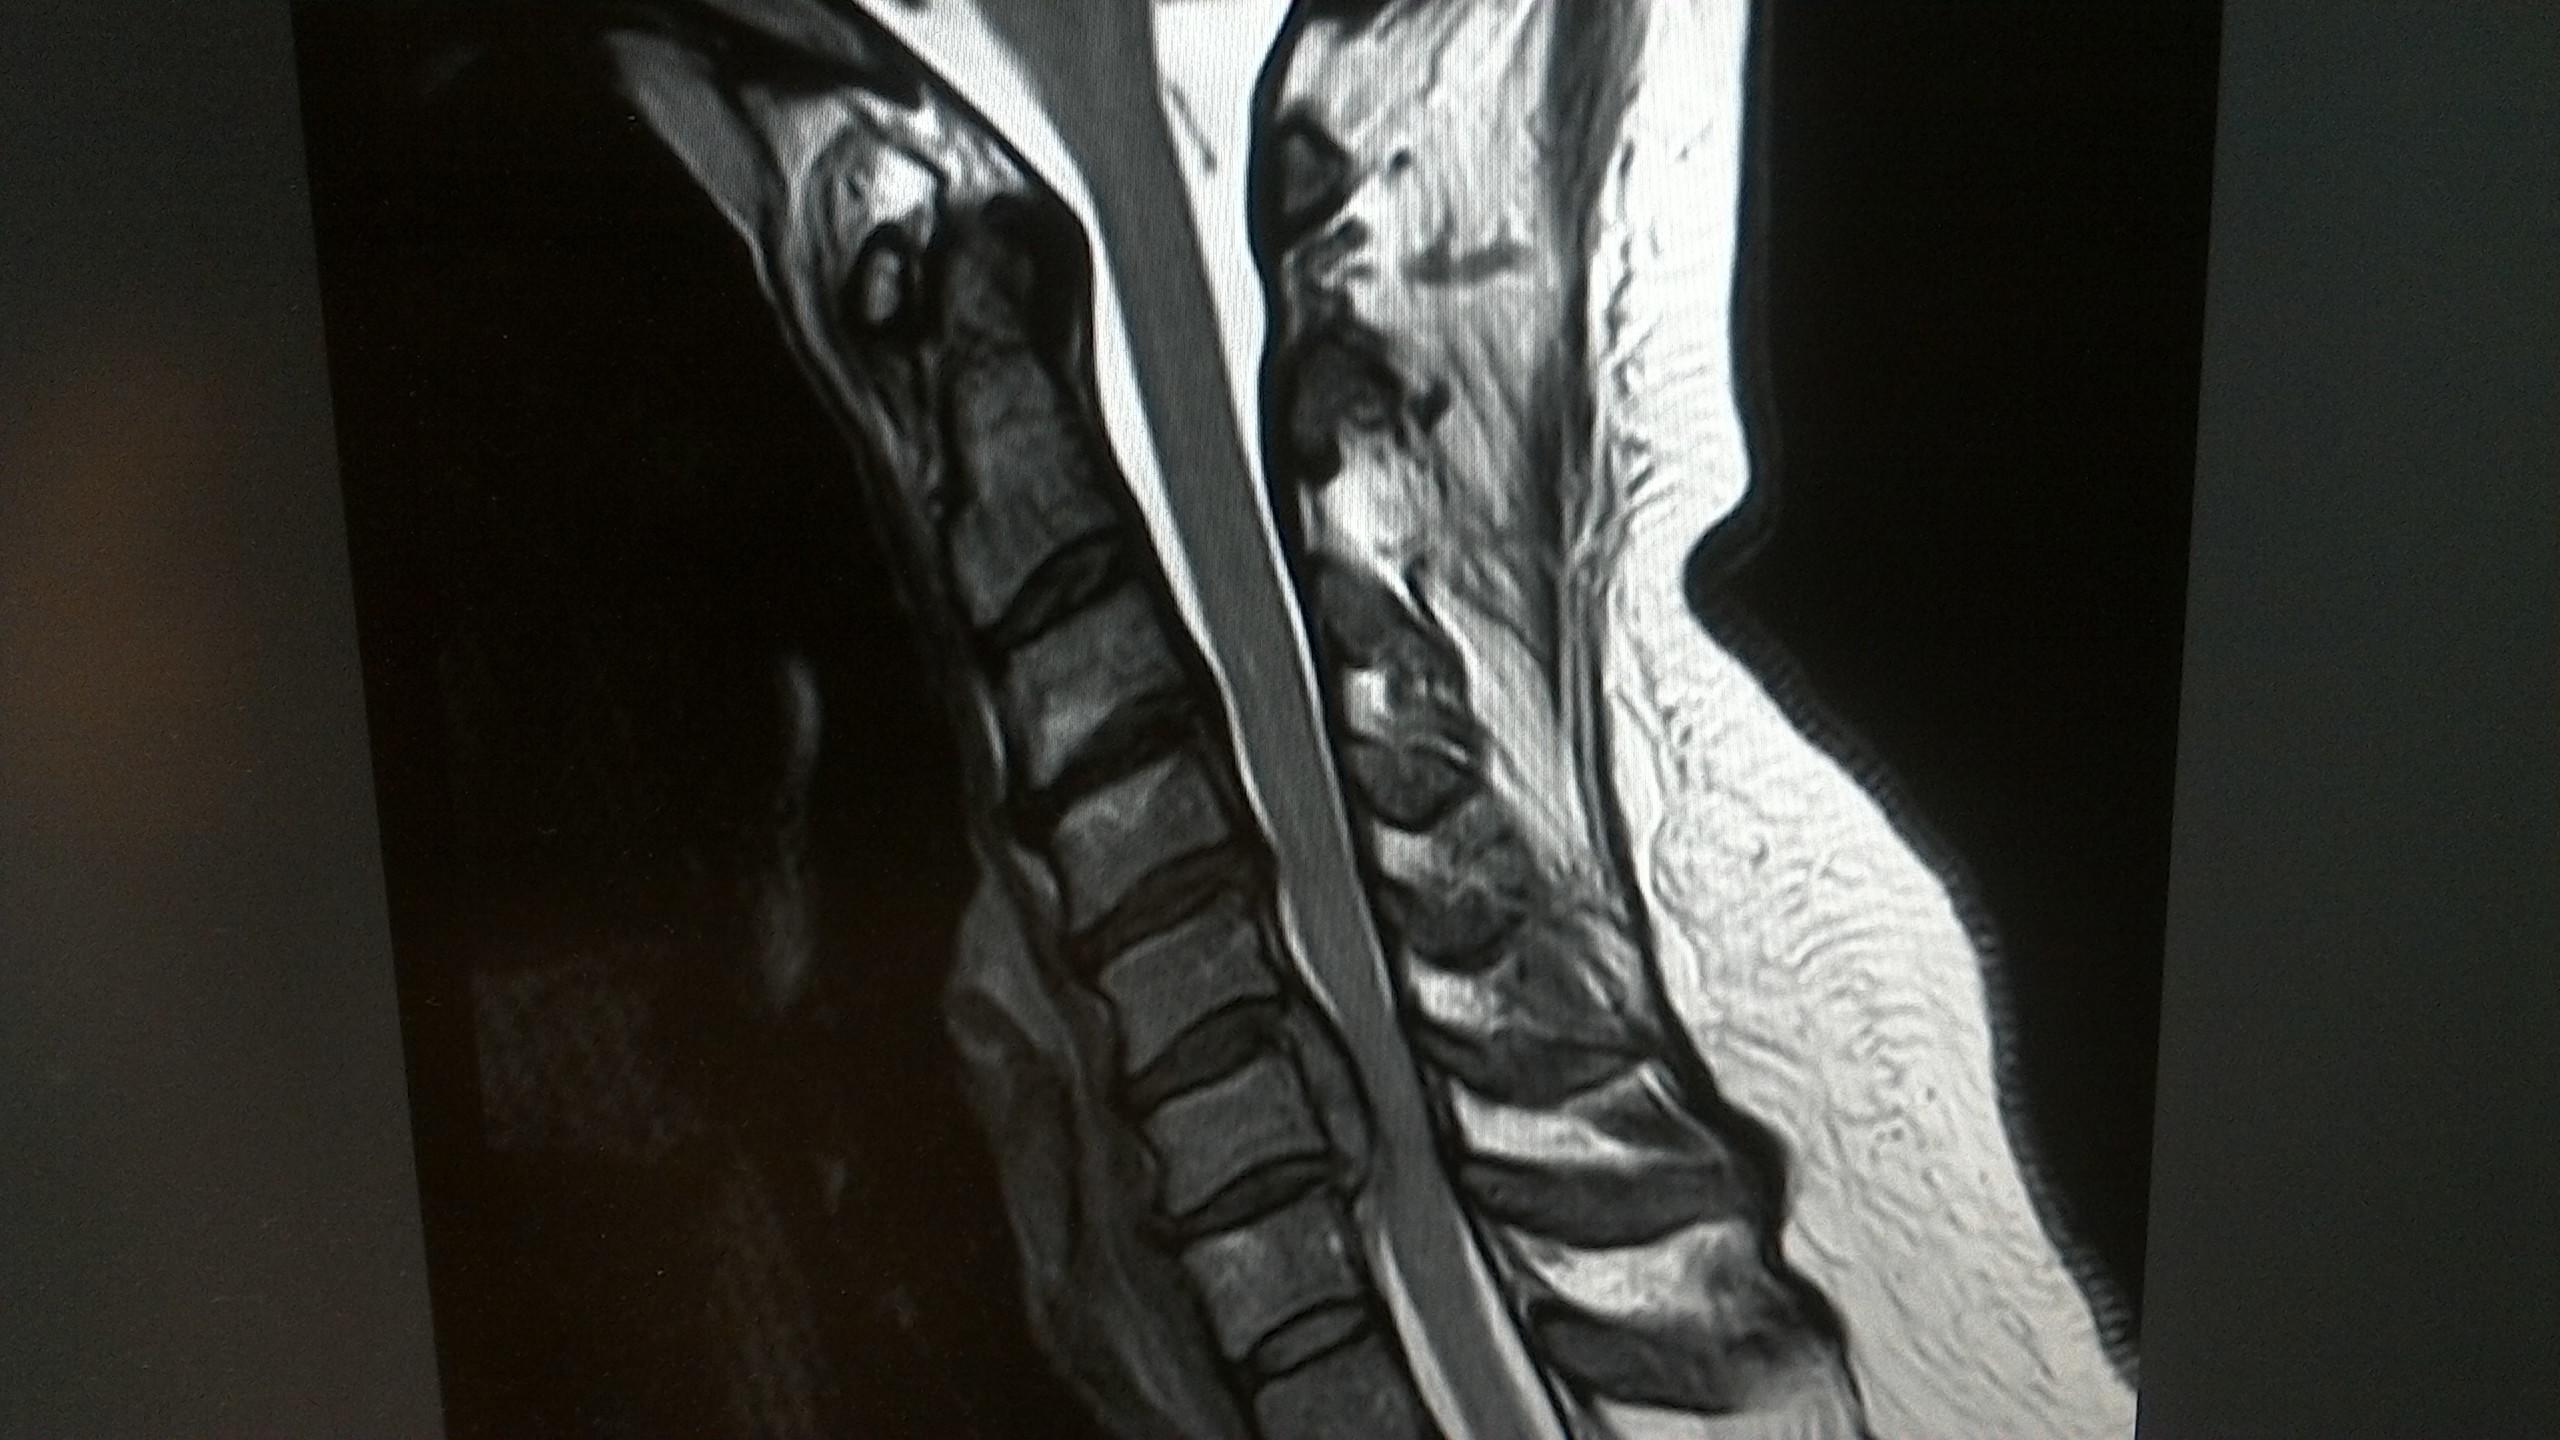 Rückenmark – A.T. Mameghani, MD